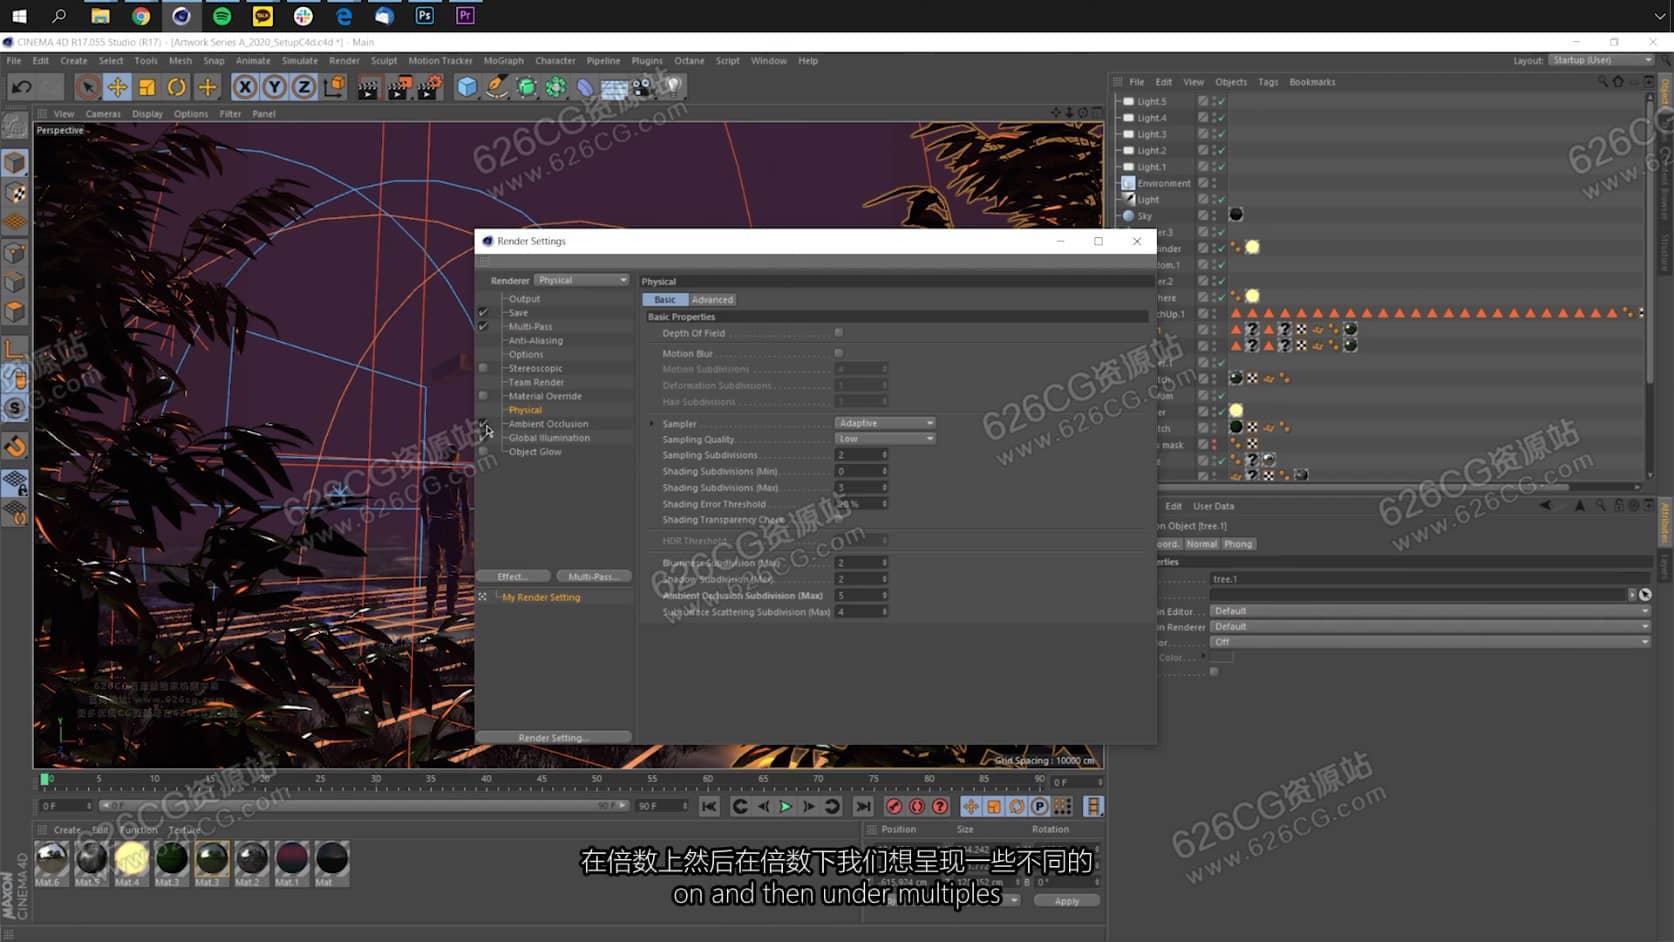 C4D教程:艺术封面设计制作学习 MDS-Modern Design in Cinema 4D 中文字幕 626CG资源站